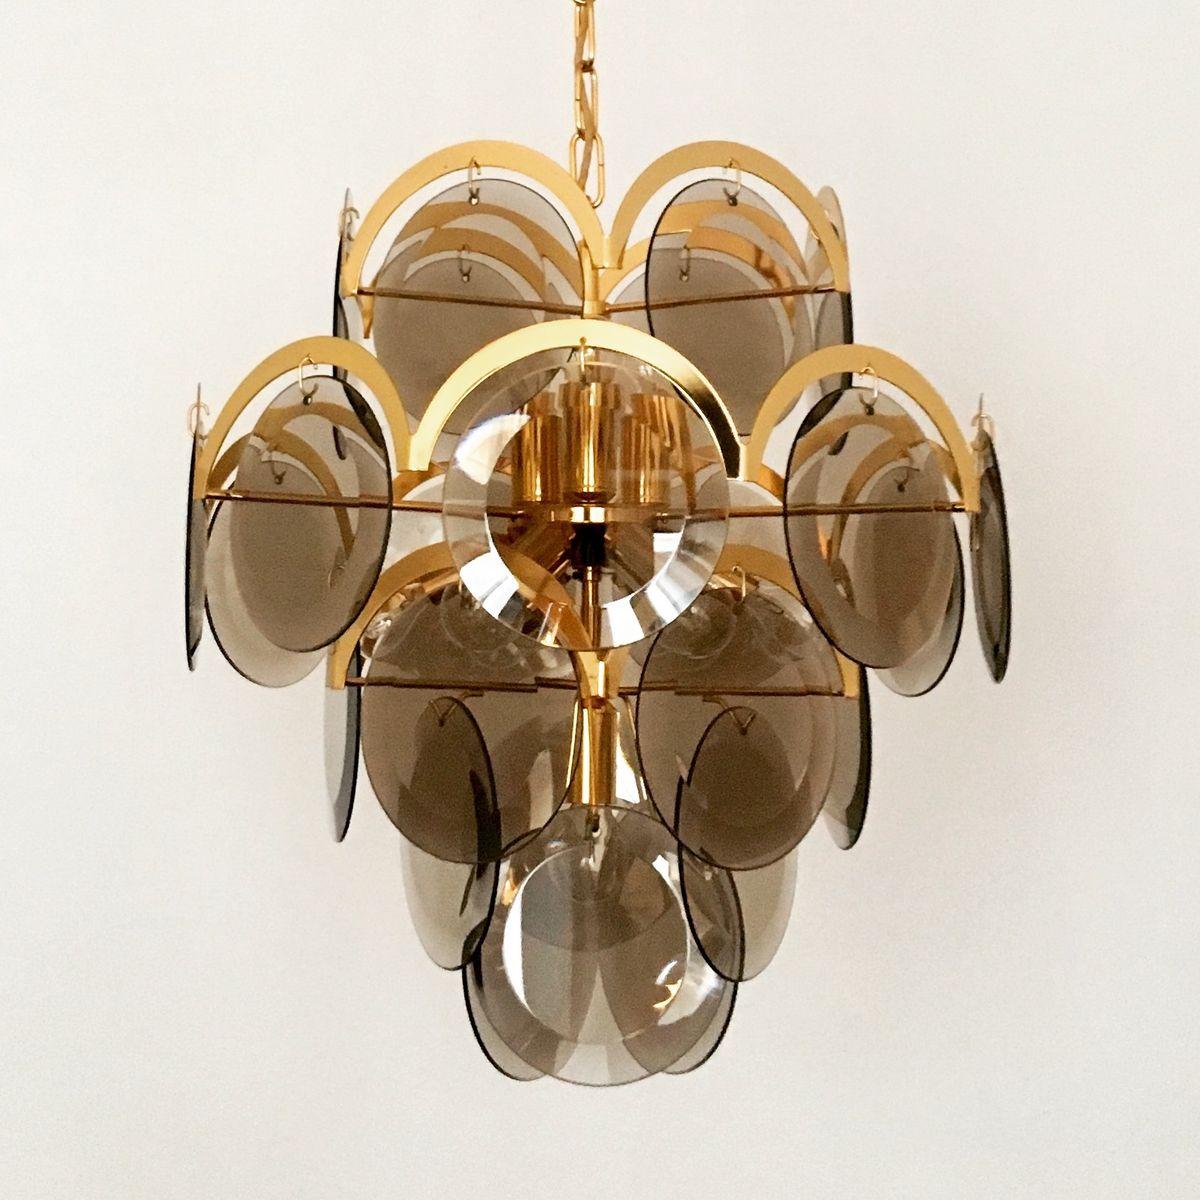 gro e vergoldete lampe von vistosi 1960er bei pamono kaufen. Black Bedroom Furniture Sets. Home Design Ideas